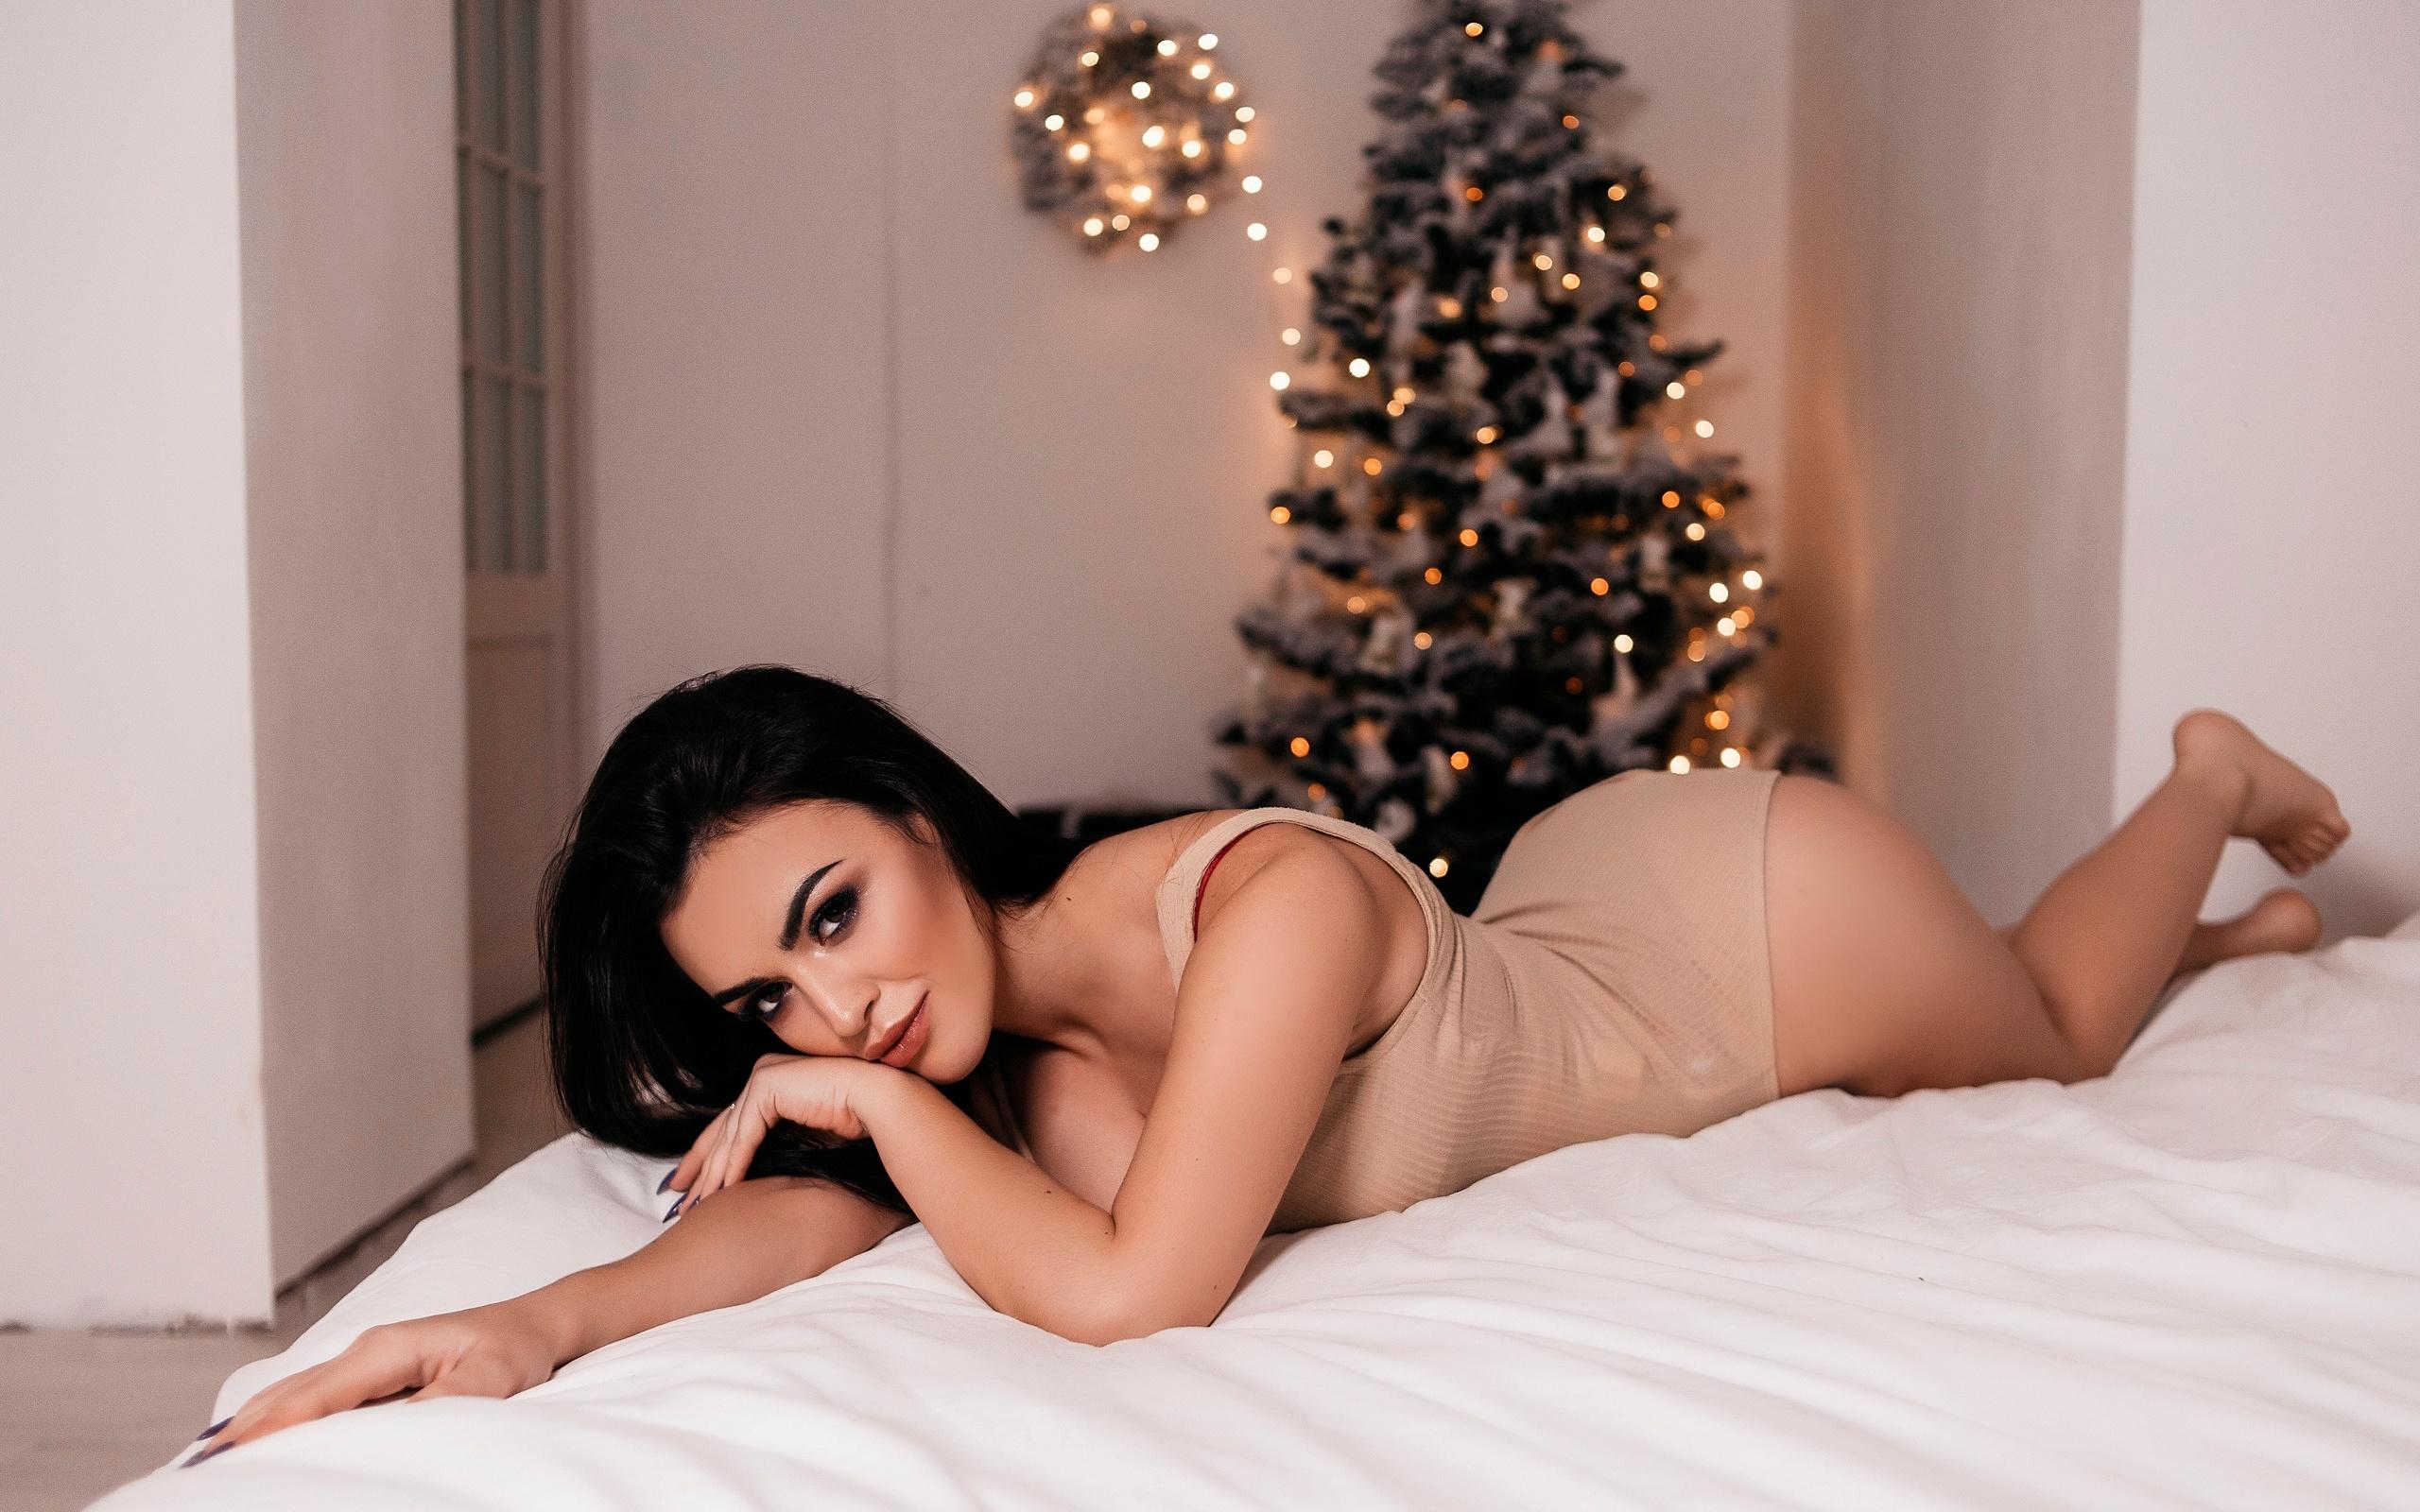 women, christmas tree, ass, bodysuit, in bed, smiling, women indoors, lying on front, christmas, brunette